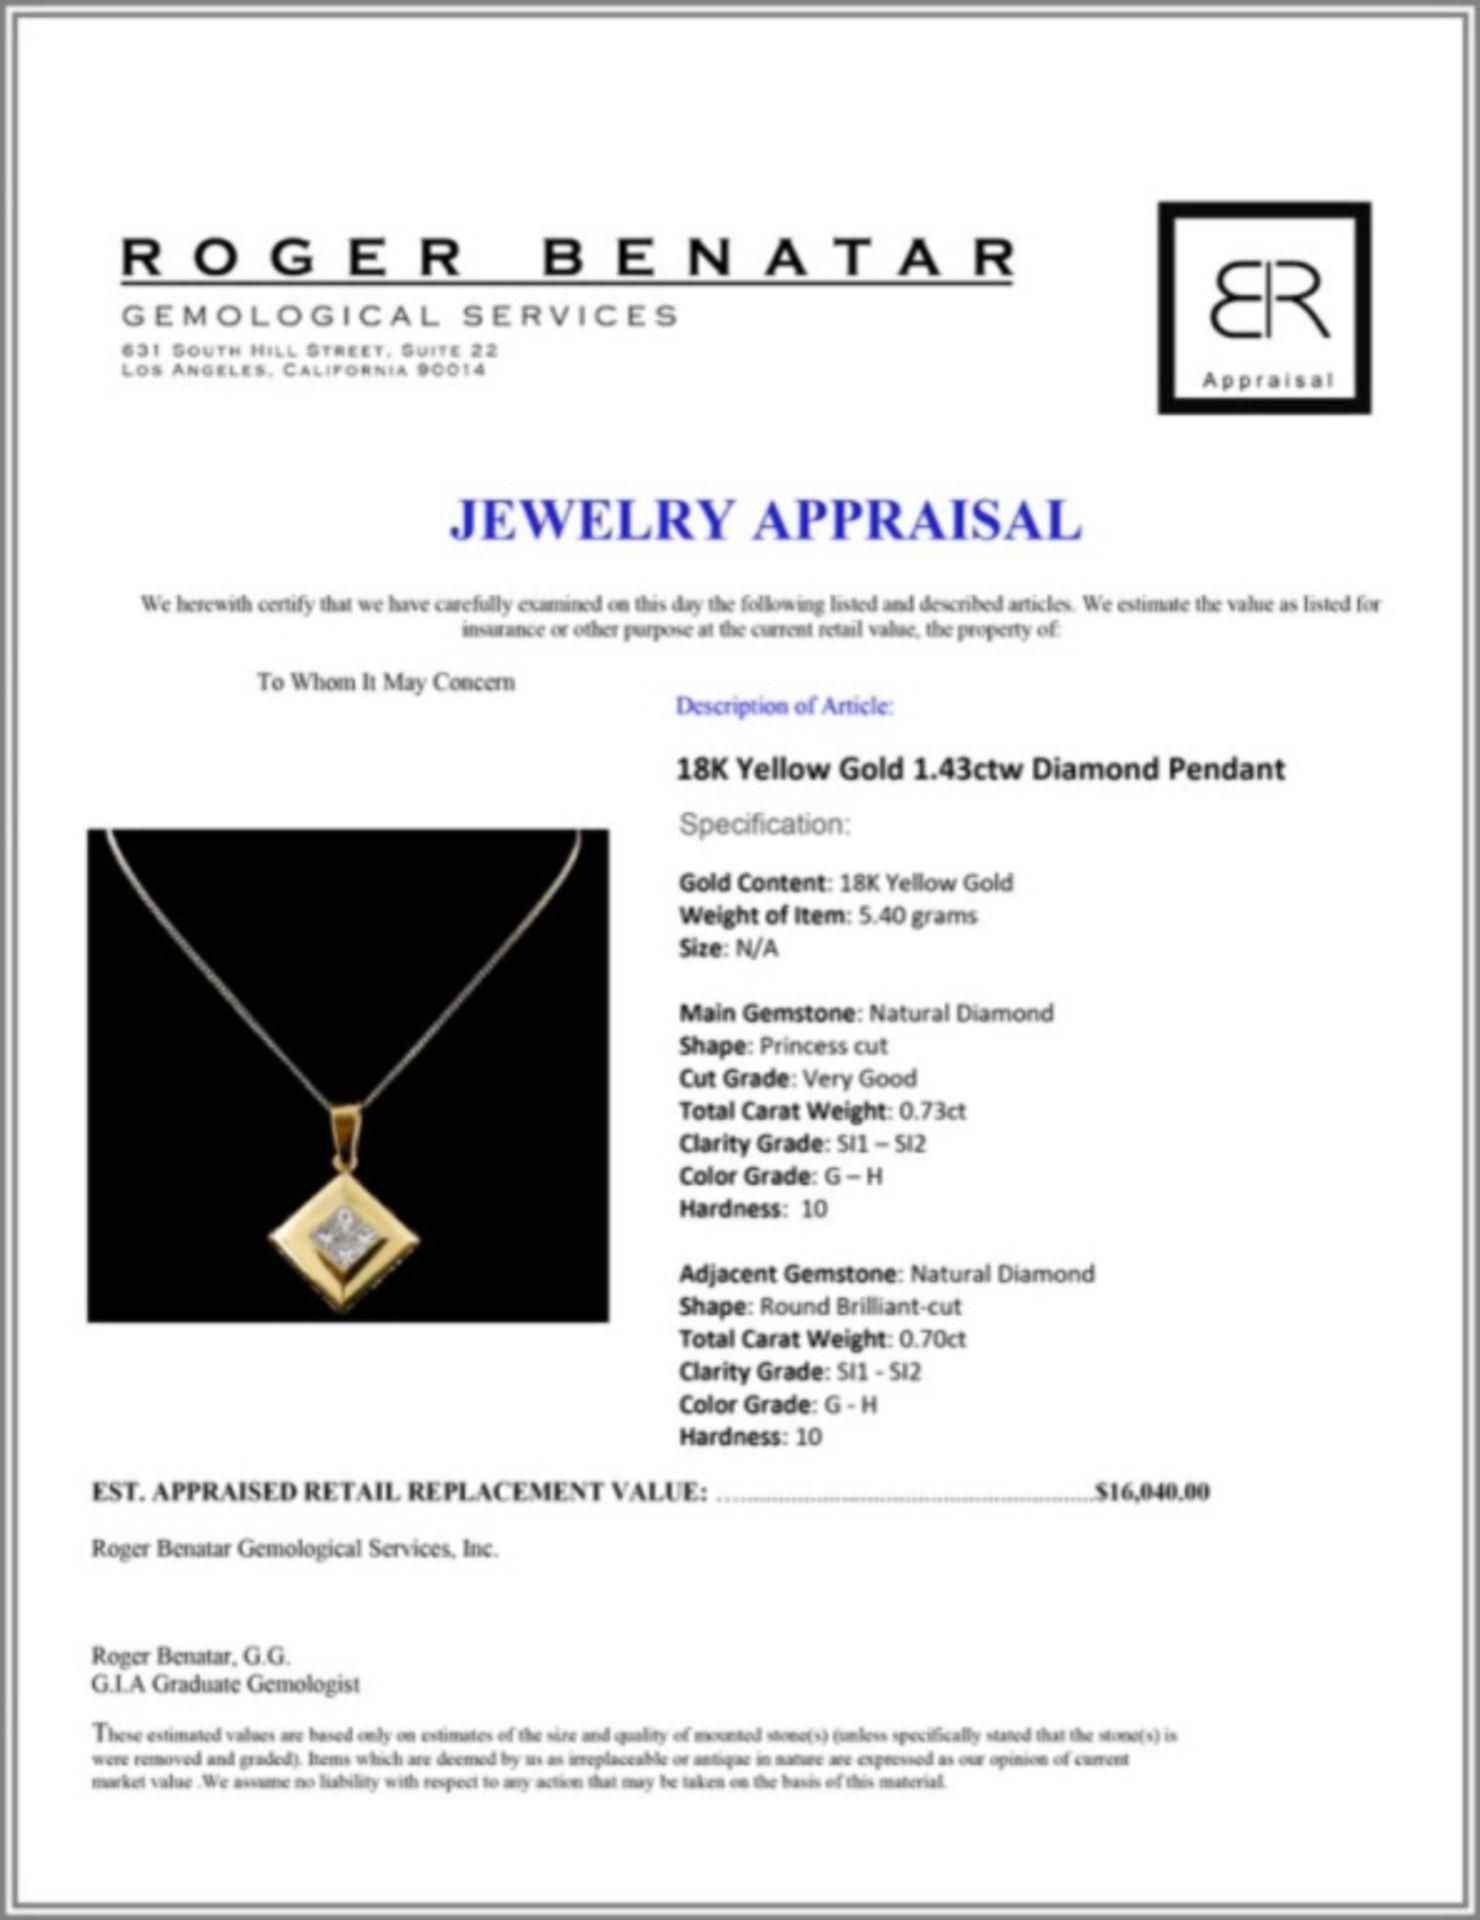 18K Yellow Gold 1.43ctw Diamond Pendant - Image 3 of 3